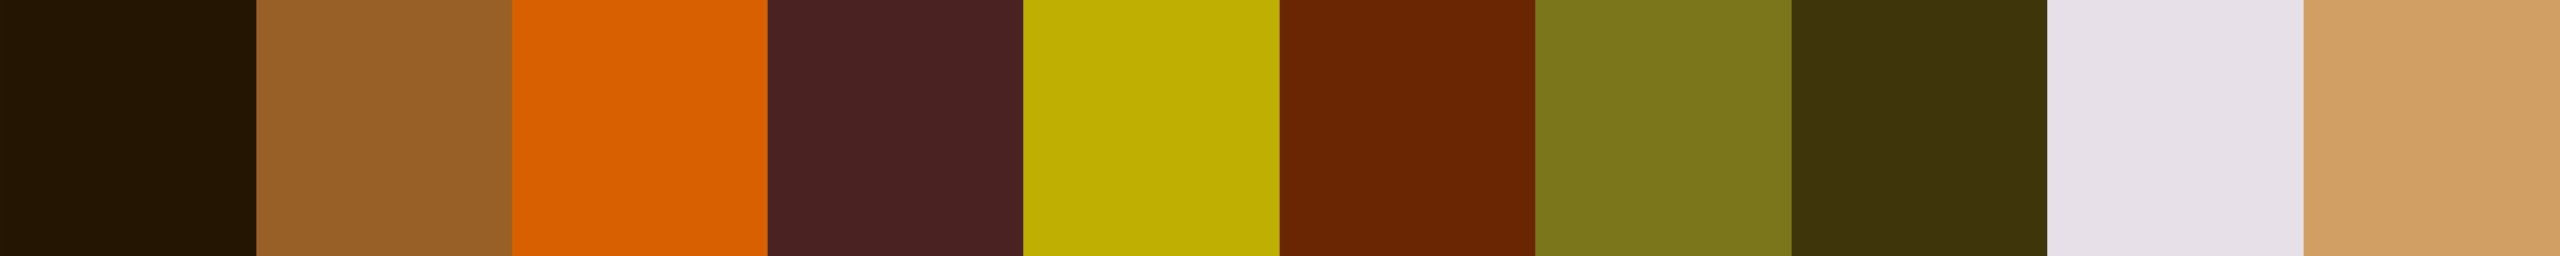 734 Titadra Color Palette